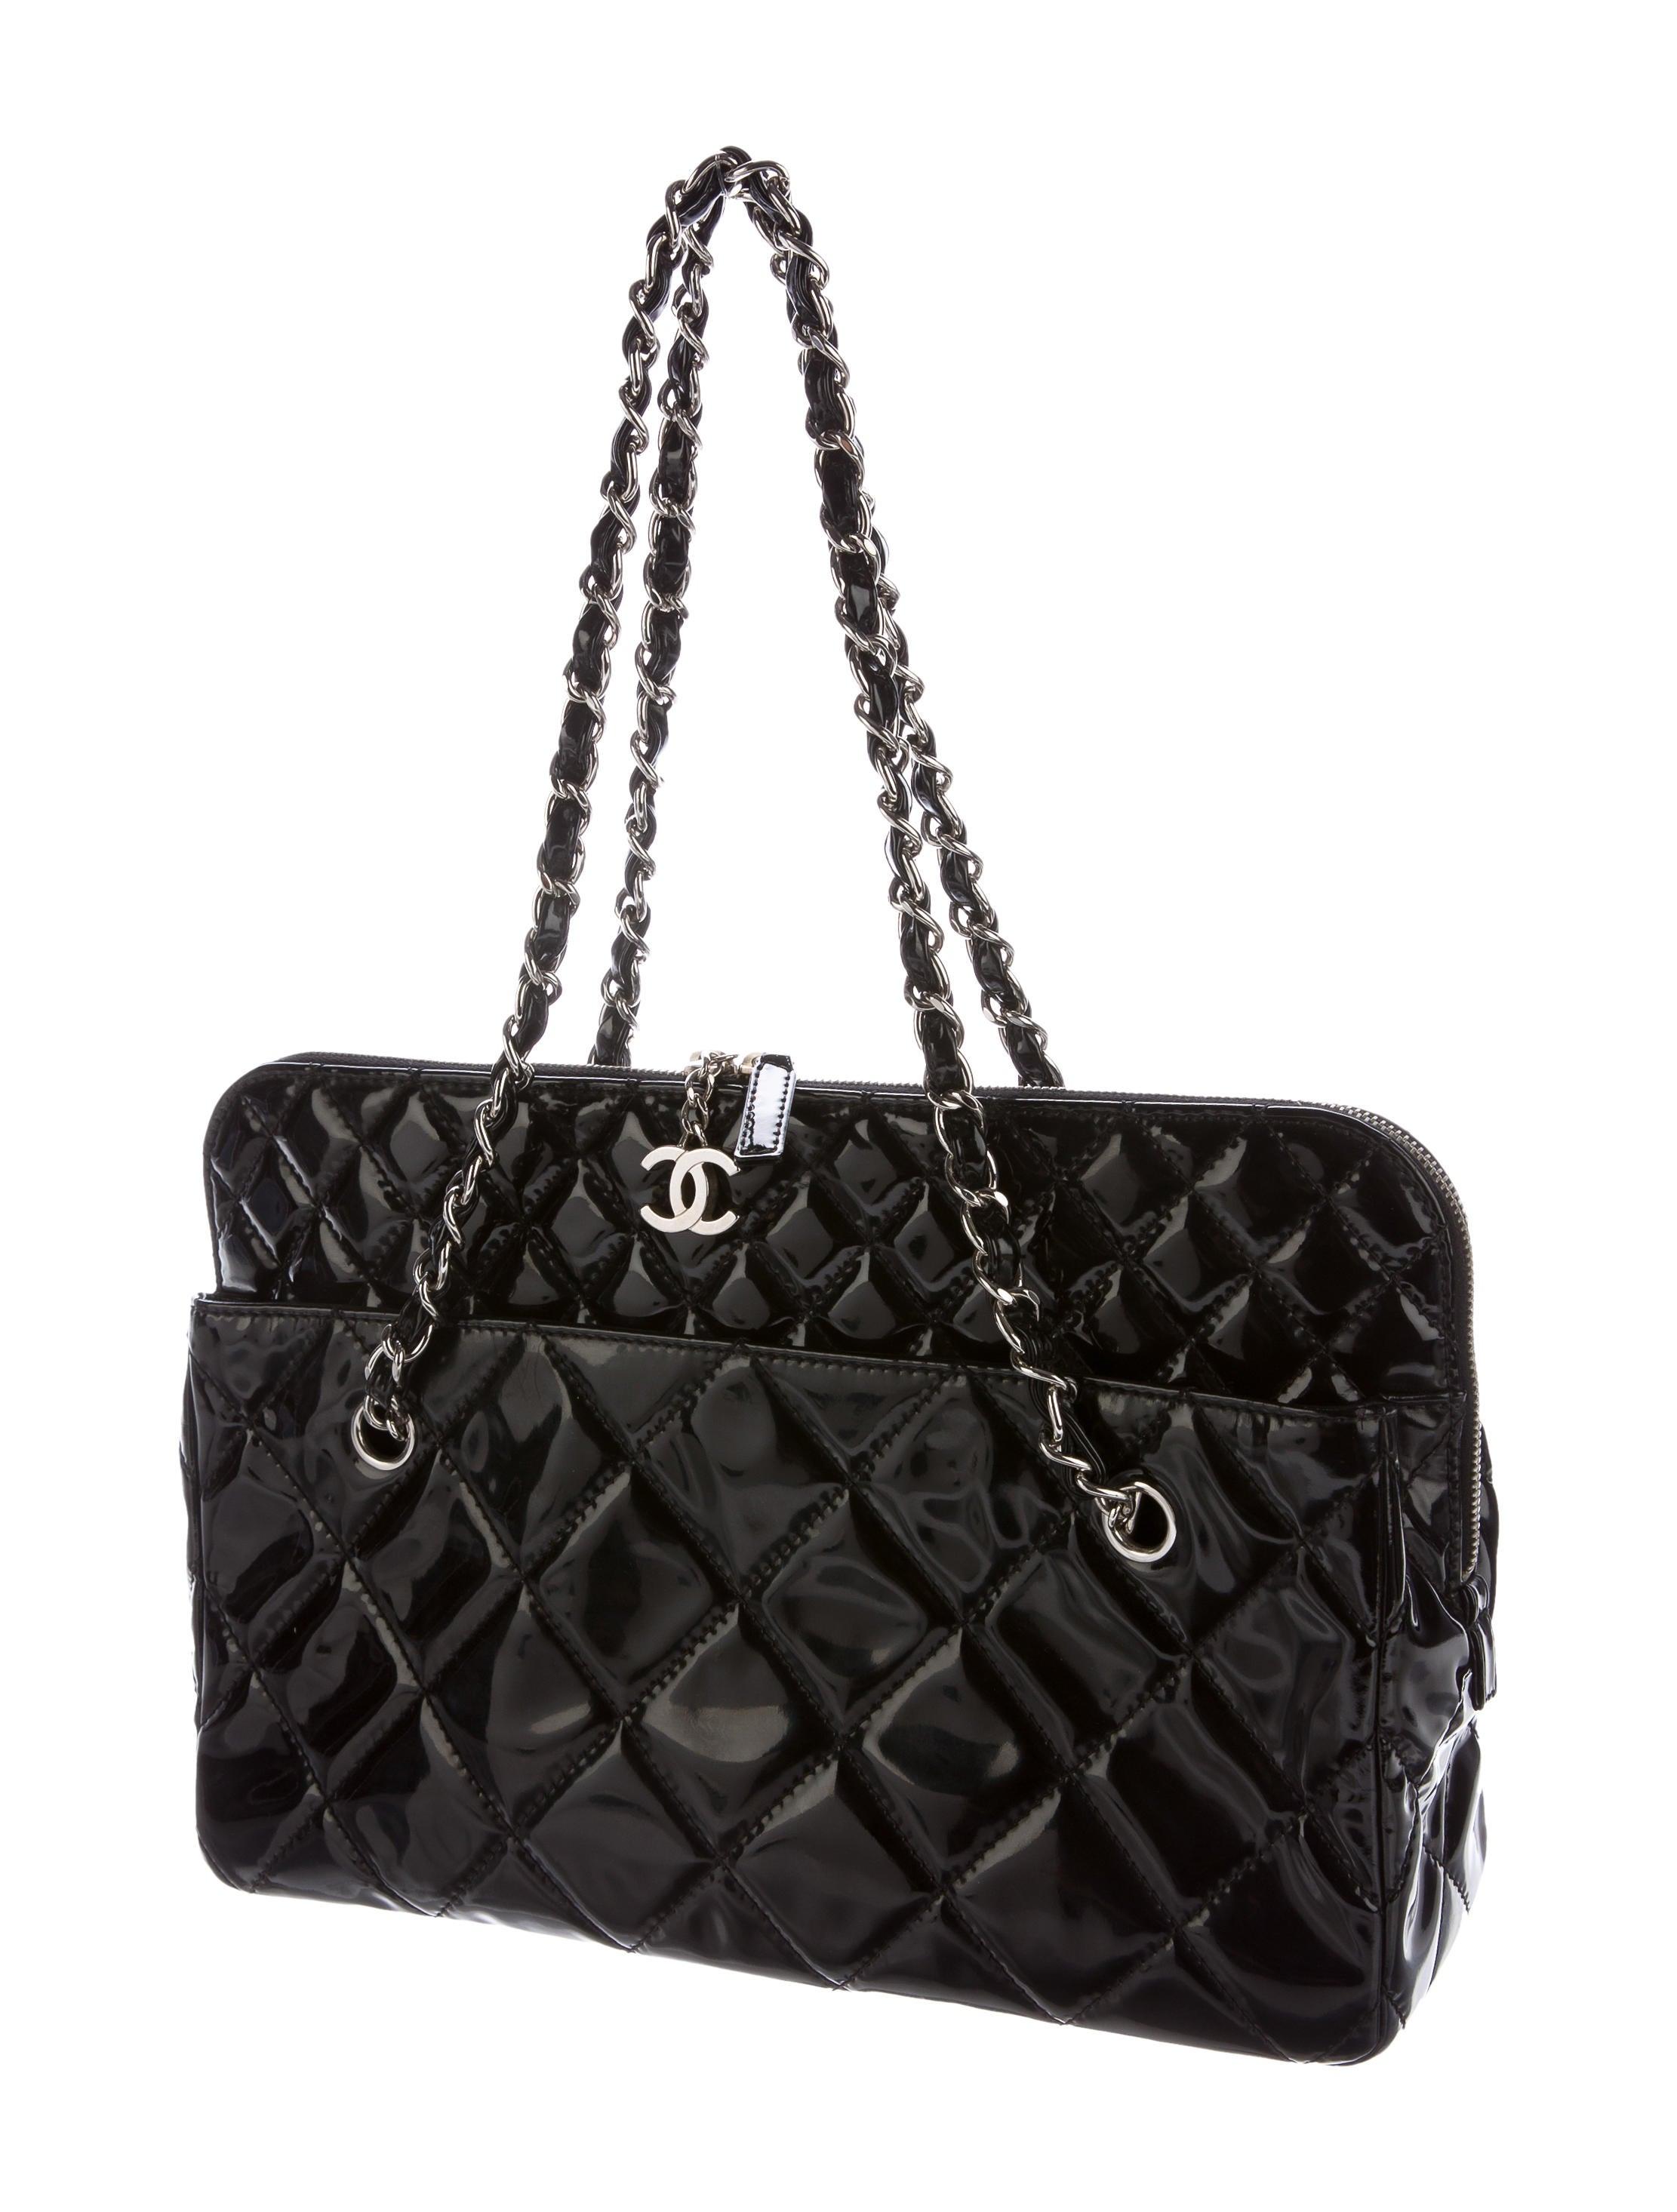 Chanel Vinyl In The Business Camera Bag Handbags